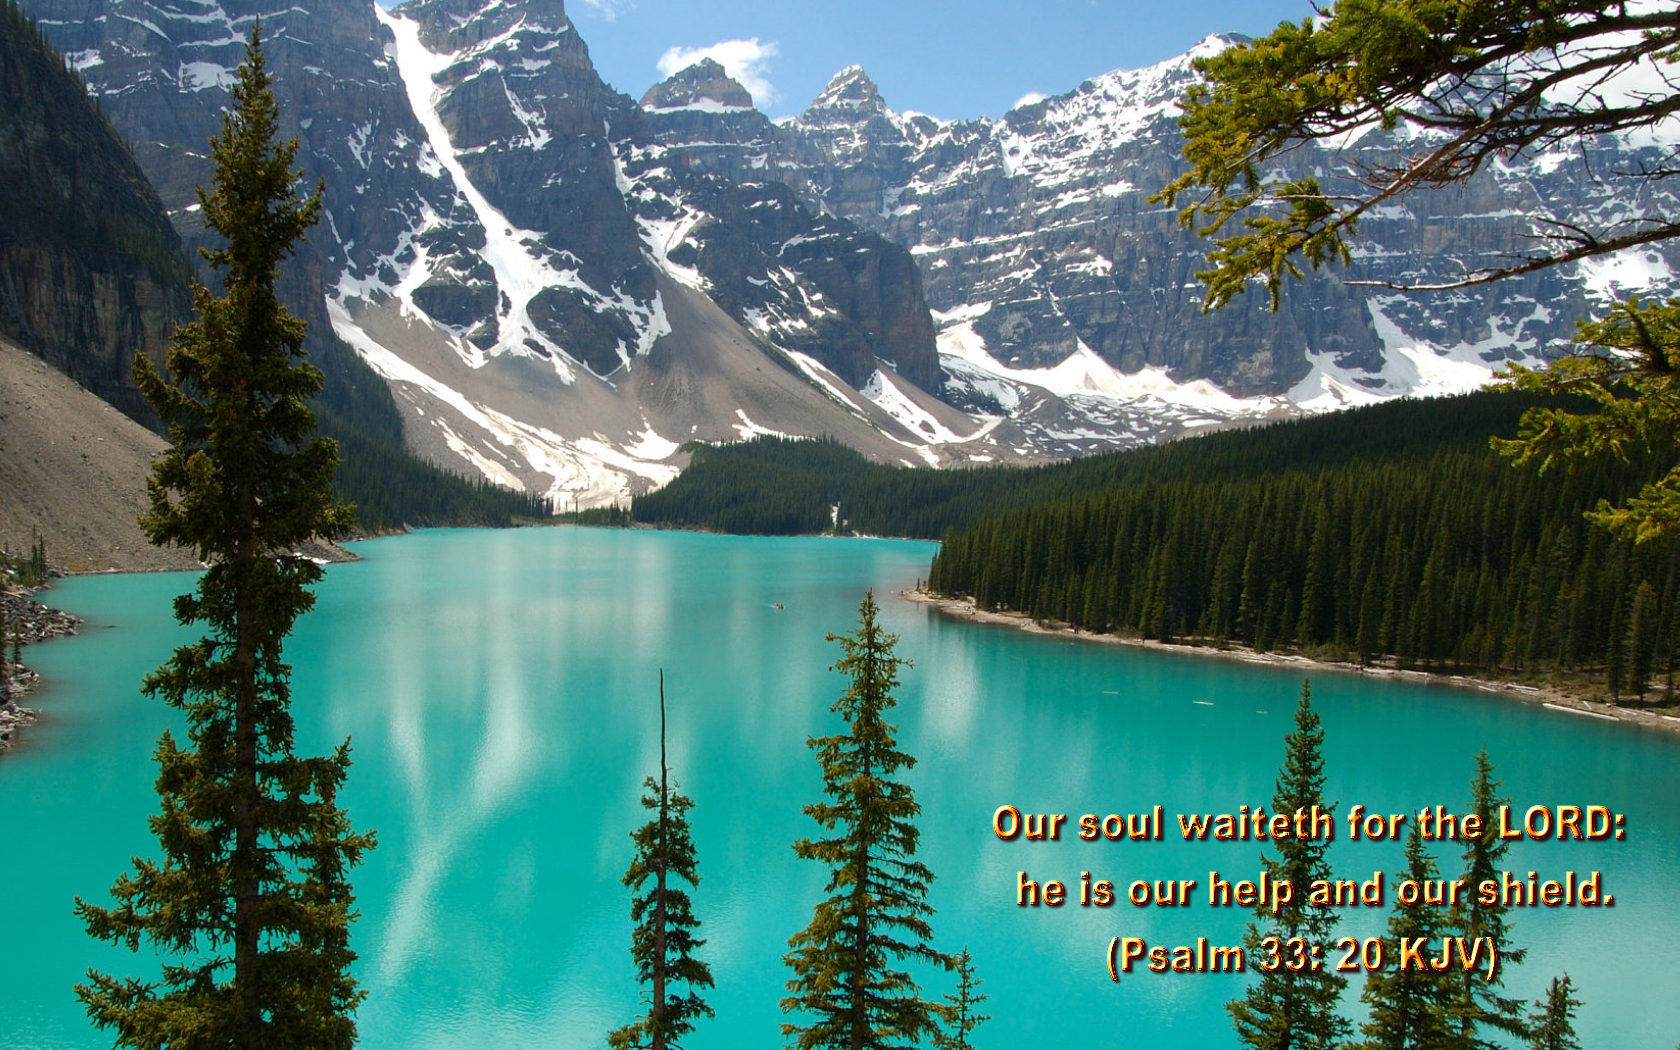 Scenic Wallpapers  Bible Verses Bibles Christian Writings eBooks 1680x1050